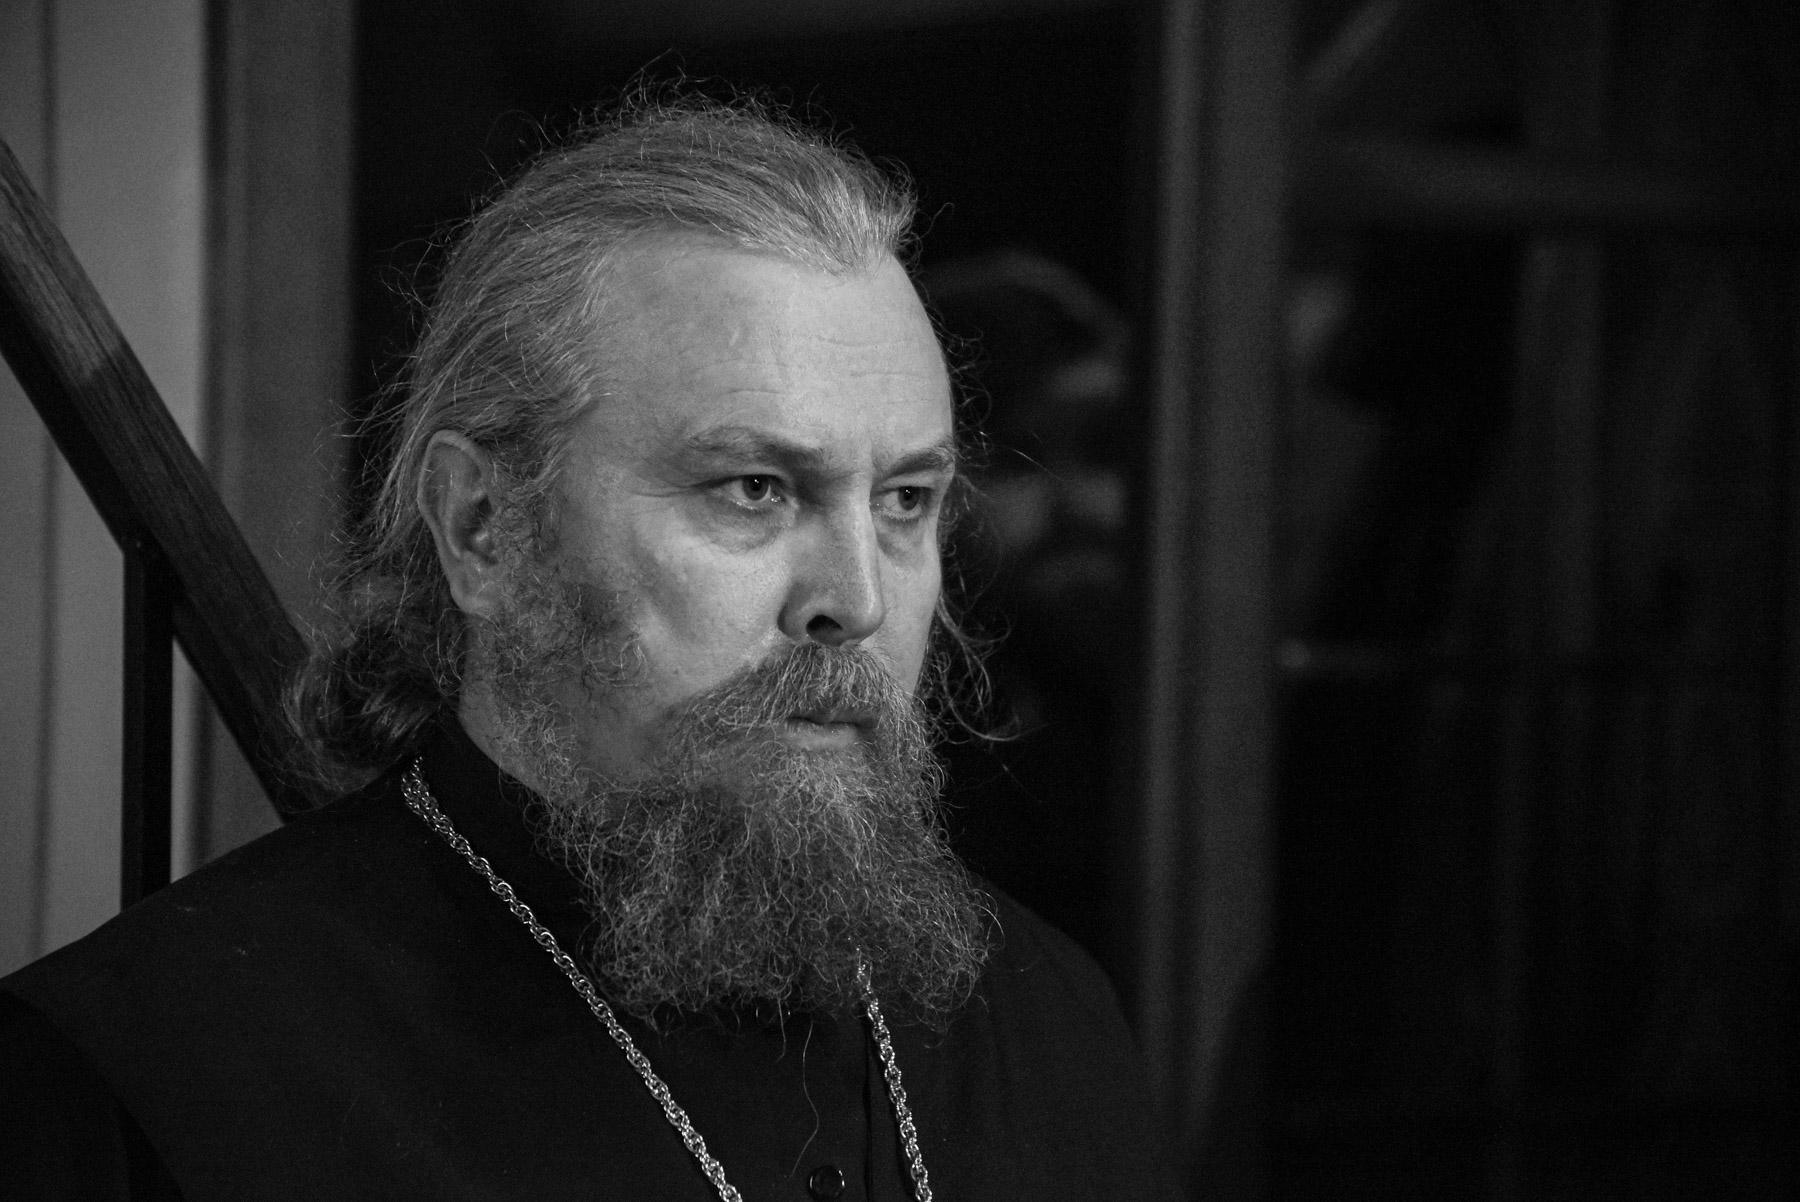 photos of orthodox christmas 0156 2